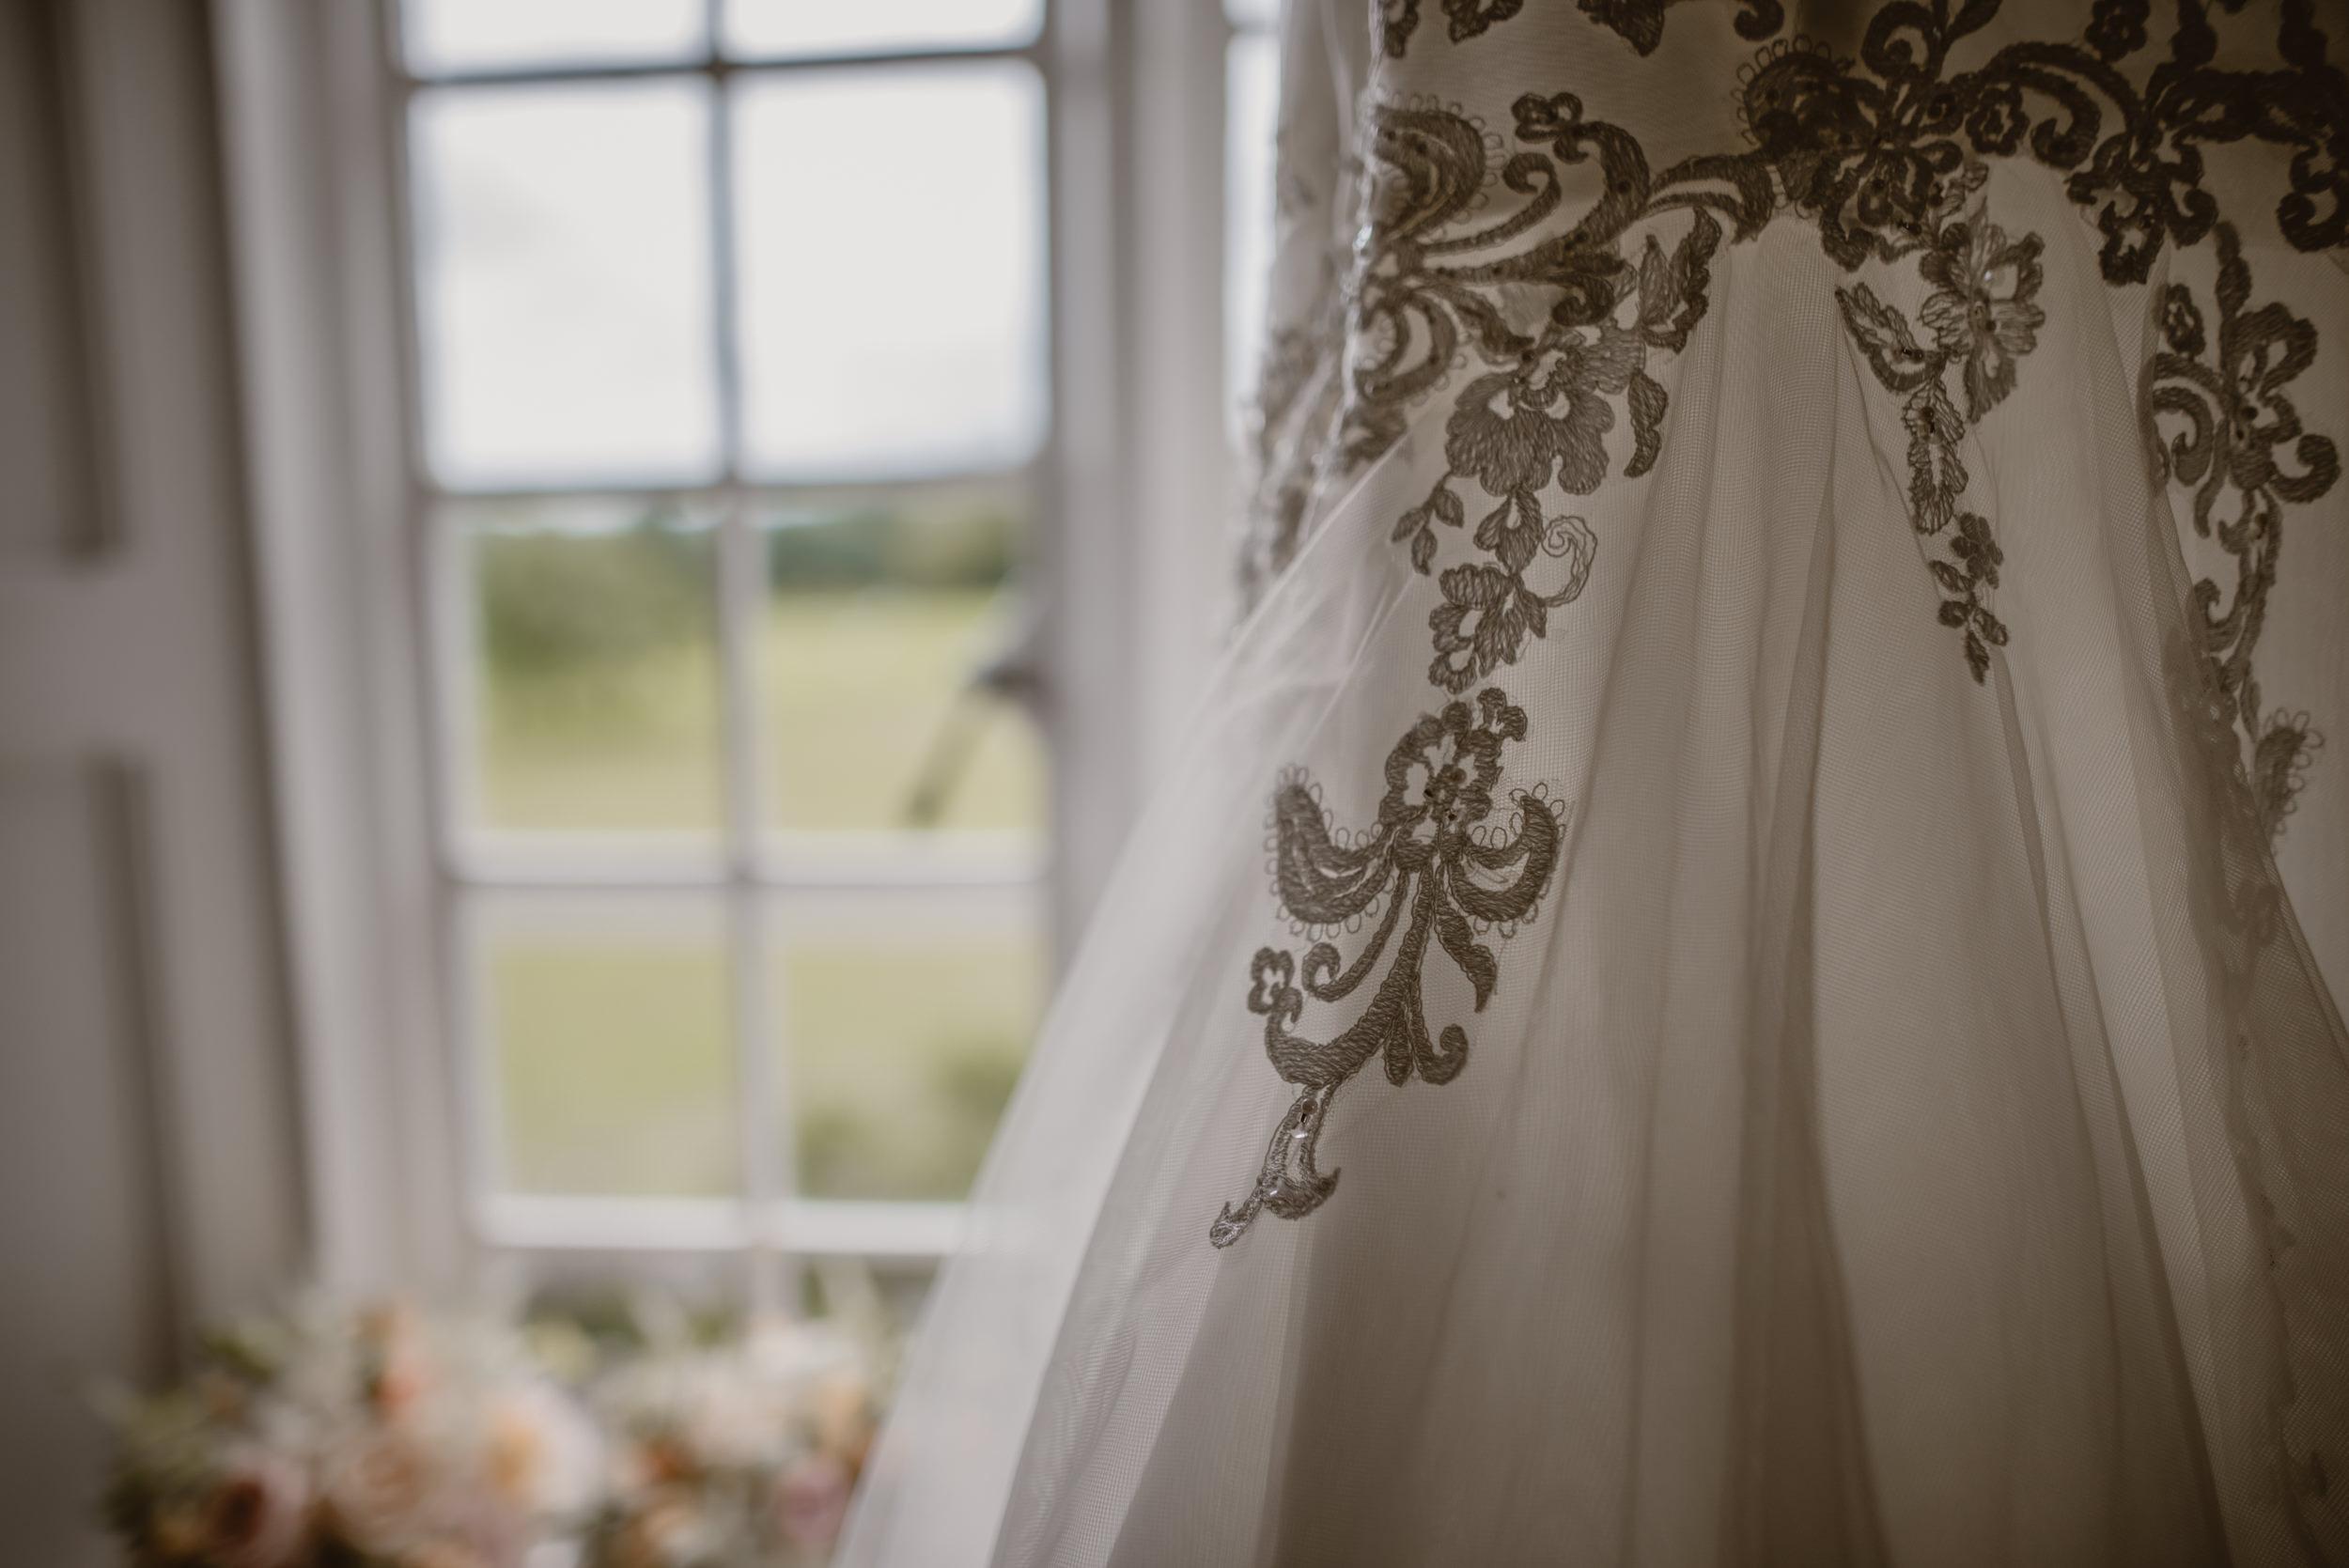 Rachel-and-James-Wedding-Horsley-Towers-State-Manu-Mendoza-Wedding-Photography-164.jpg